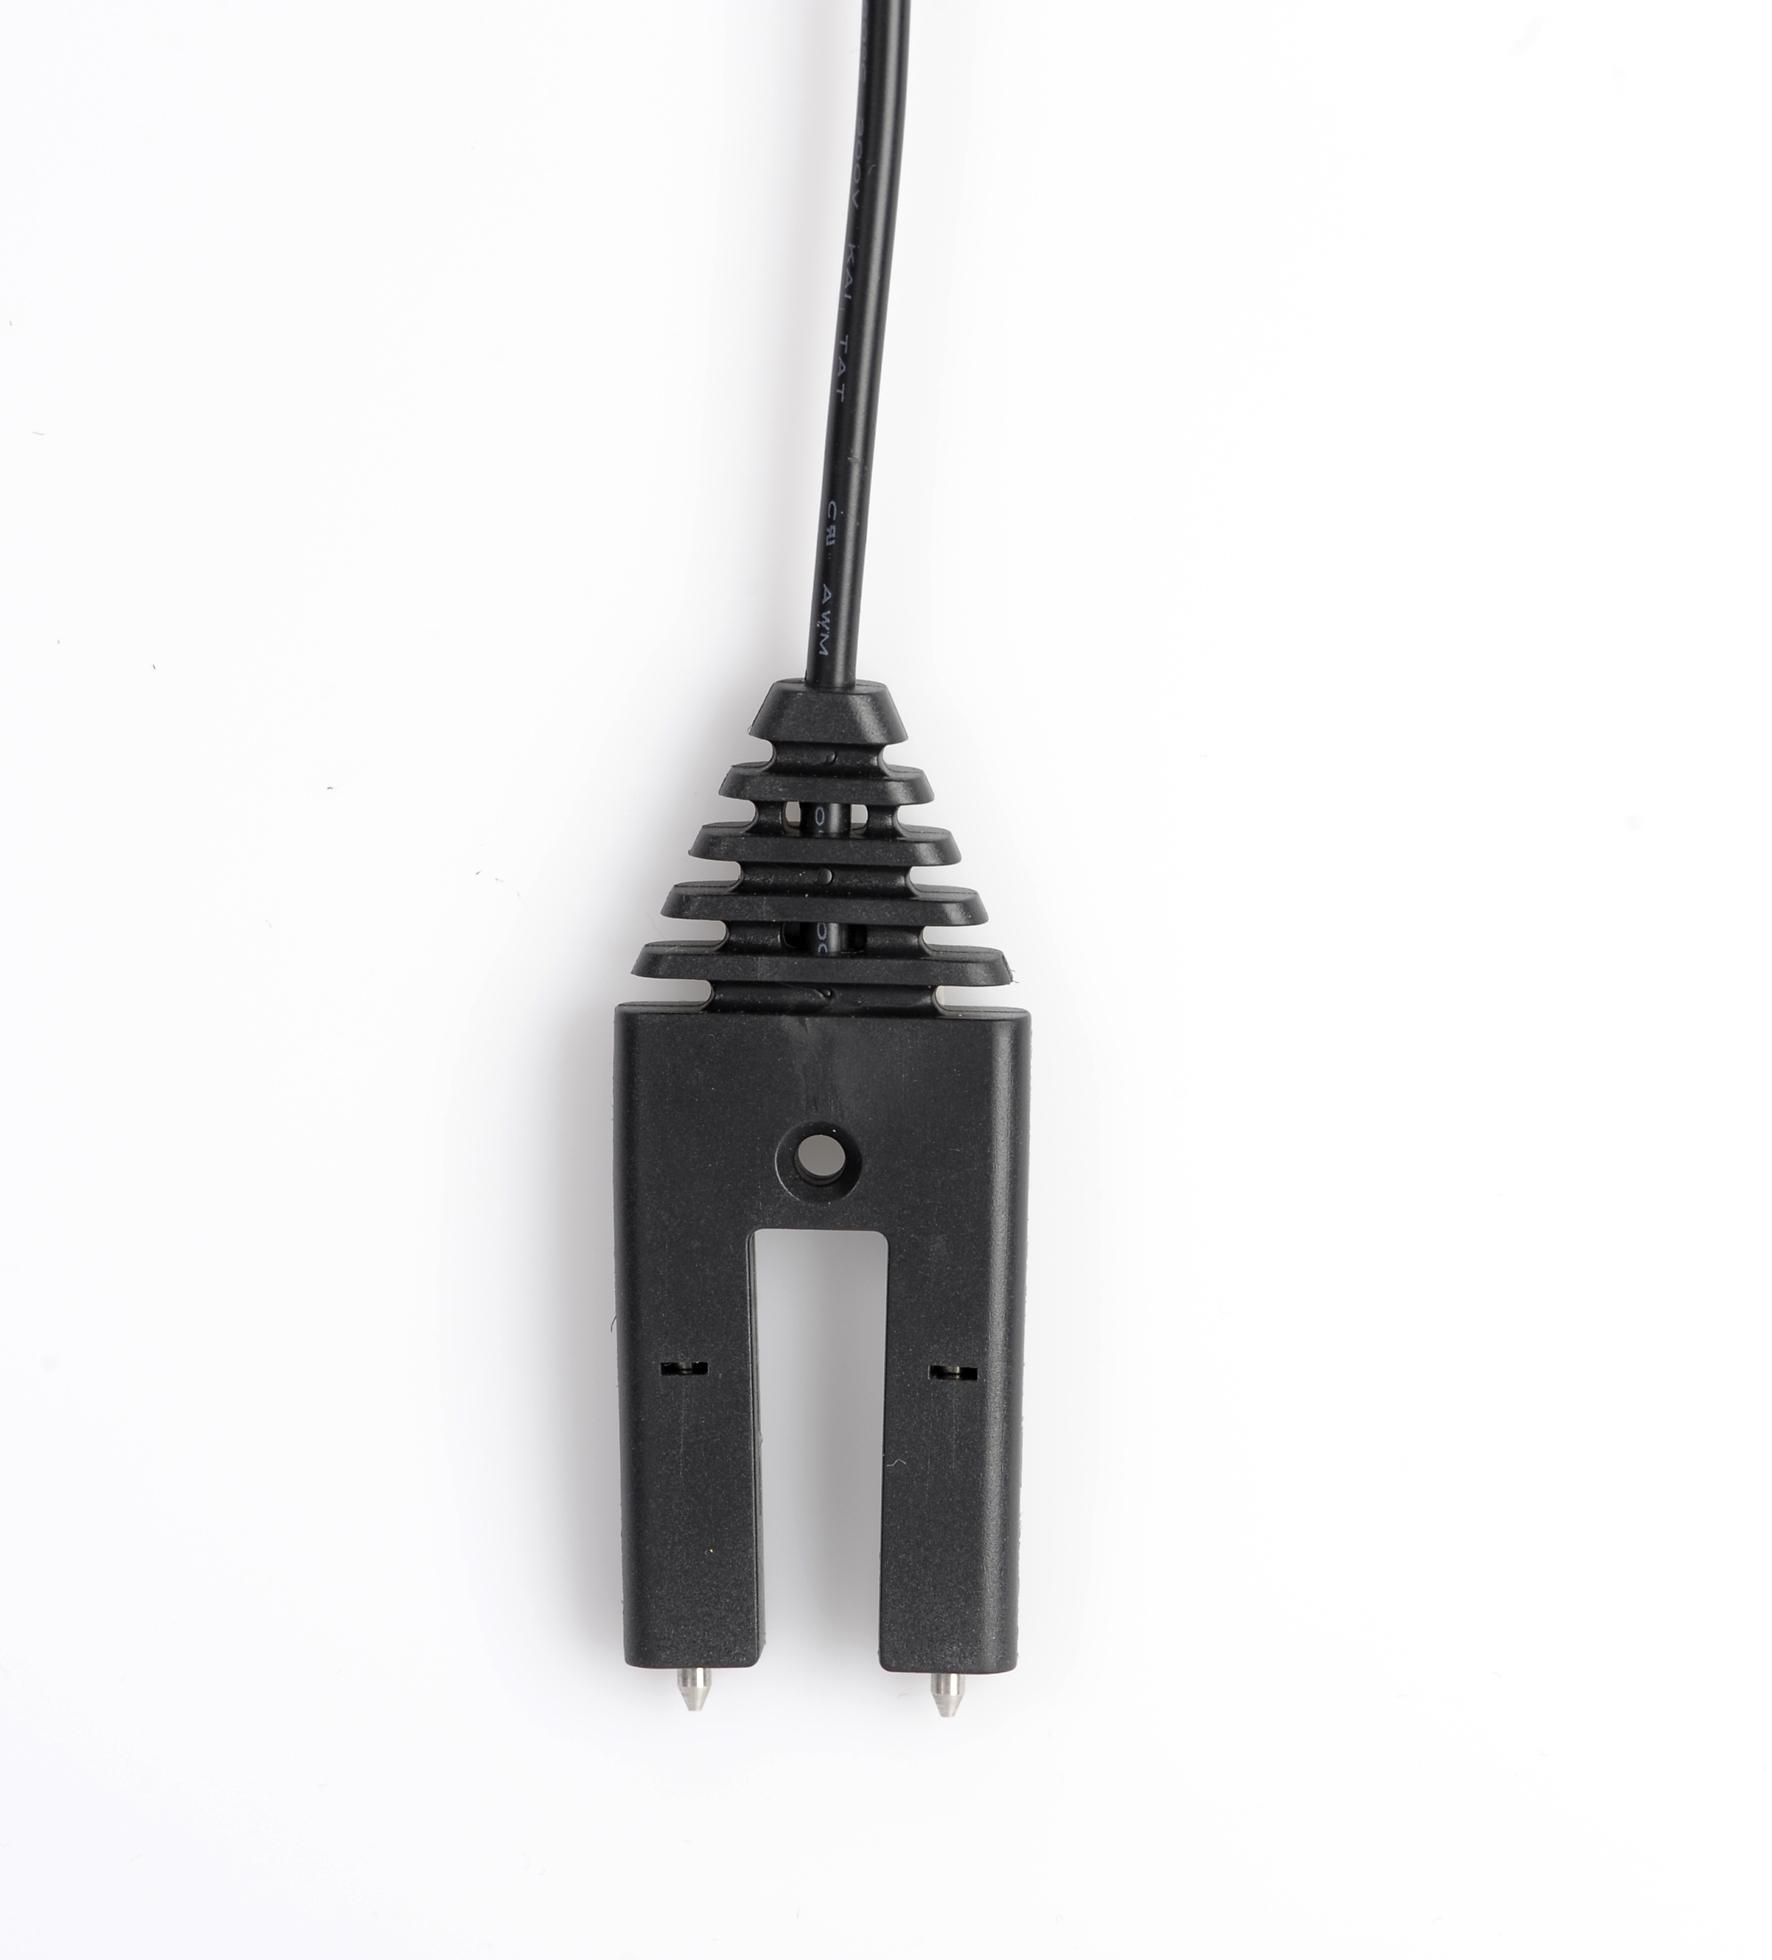 H-TRONIC WS 4010 Wassersensor passend zu Wasserpegelschalter WPS 4000